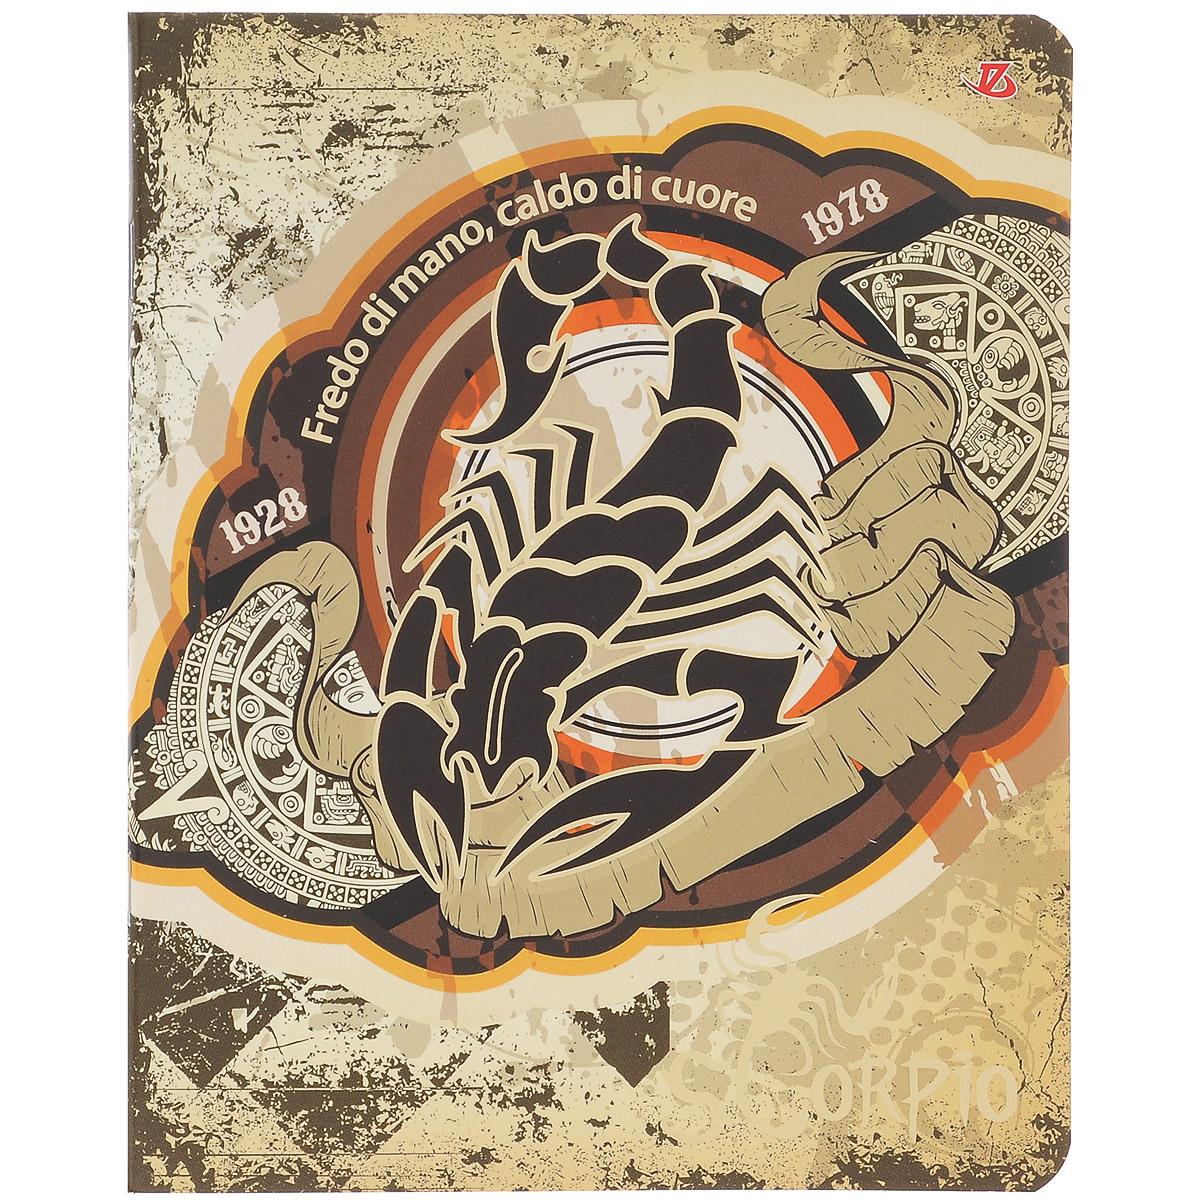 Seventeen Тетрадь в клетку Fredo di mano, caldo di cuore, 48 листов, формат А55637/4_Fredo di mano, caldo di cuore